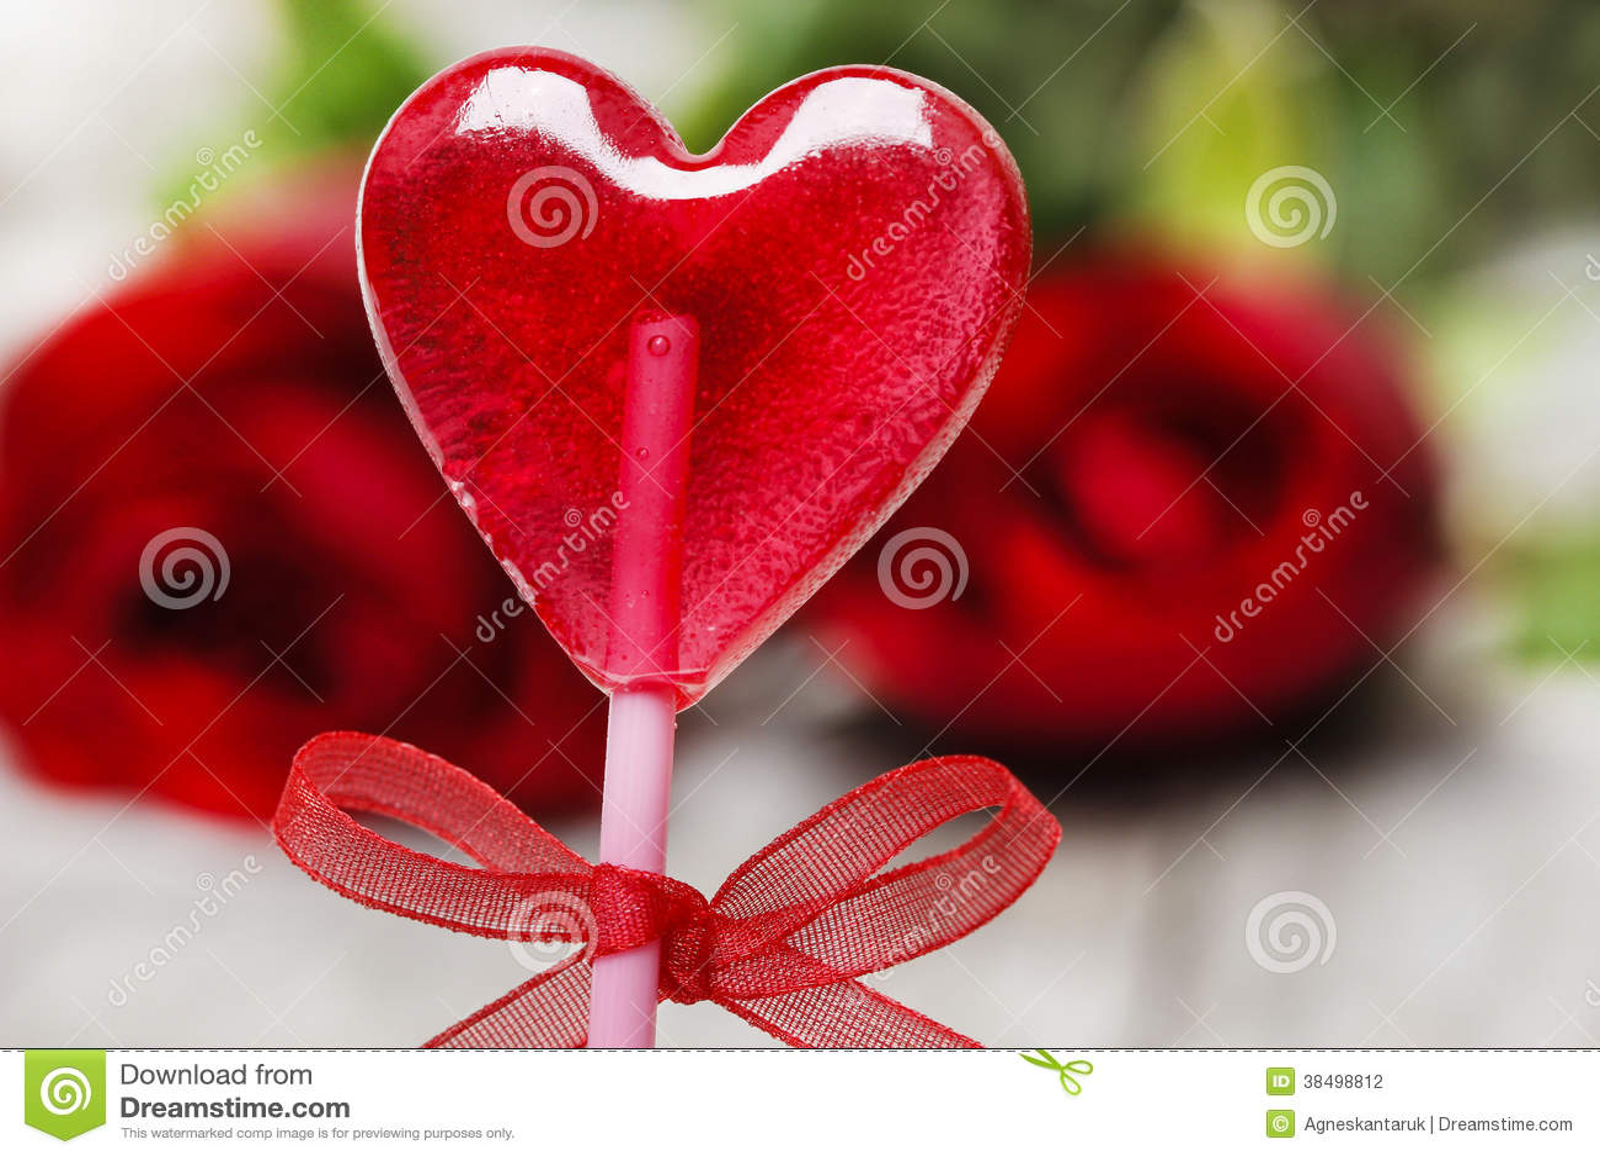 Lovely Red Lollipop In Heart Shape Symbol Of Sweet Love Stock Photo